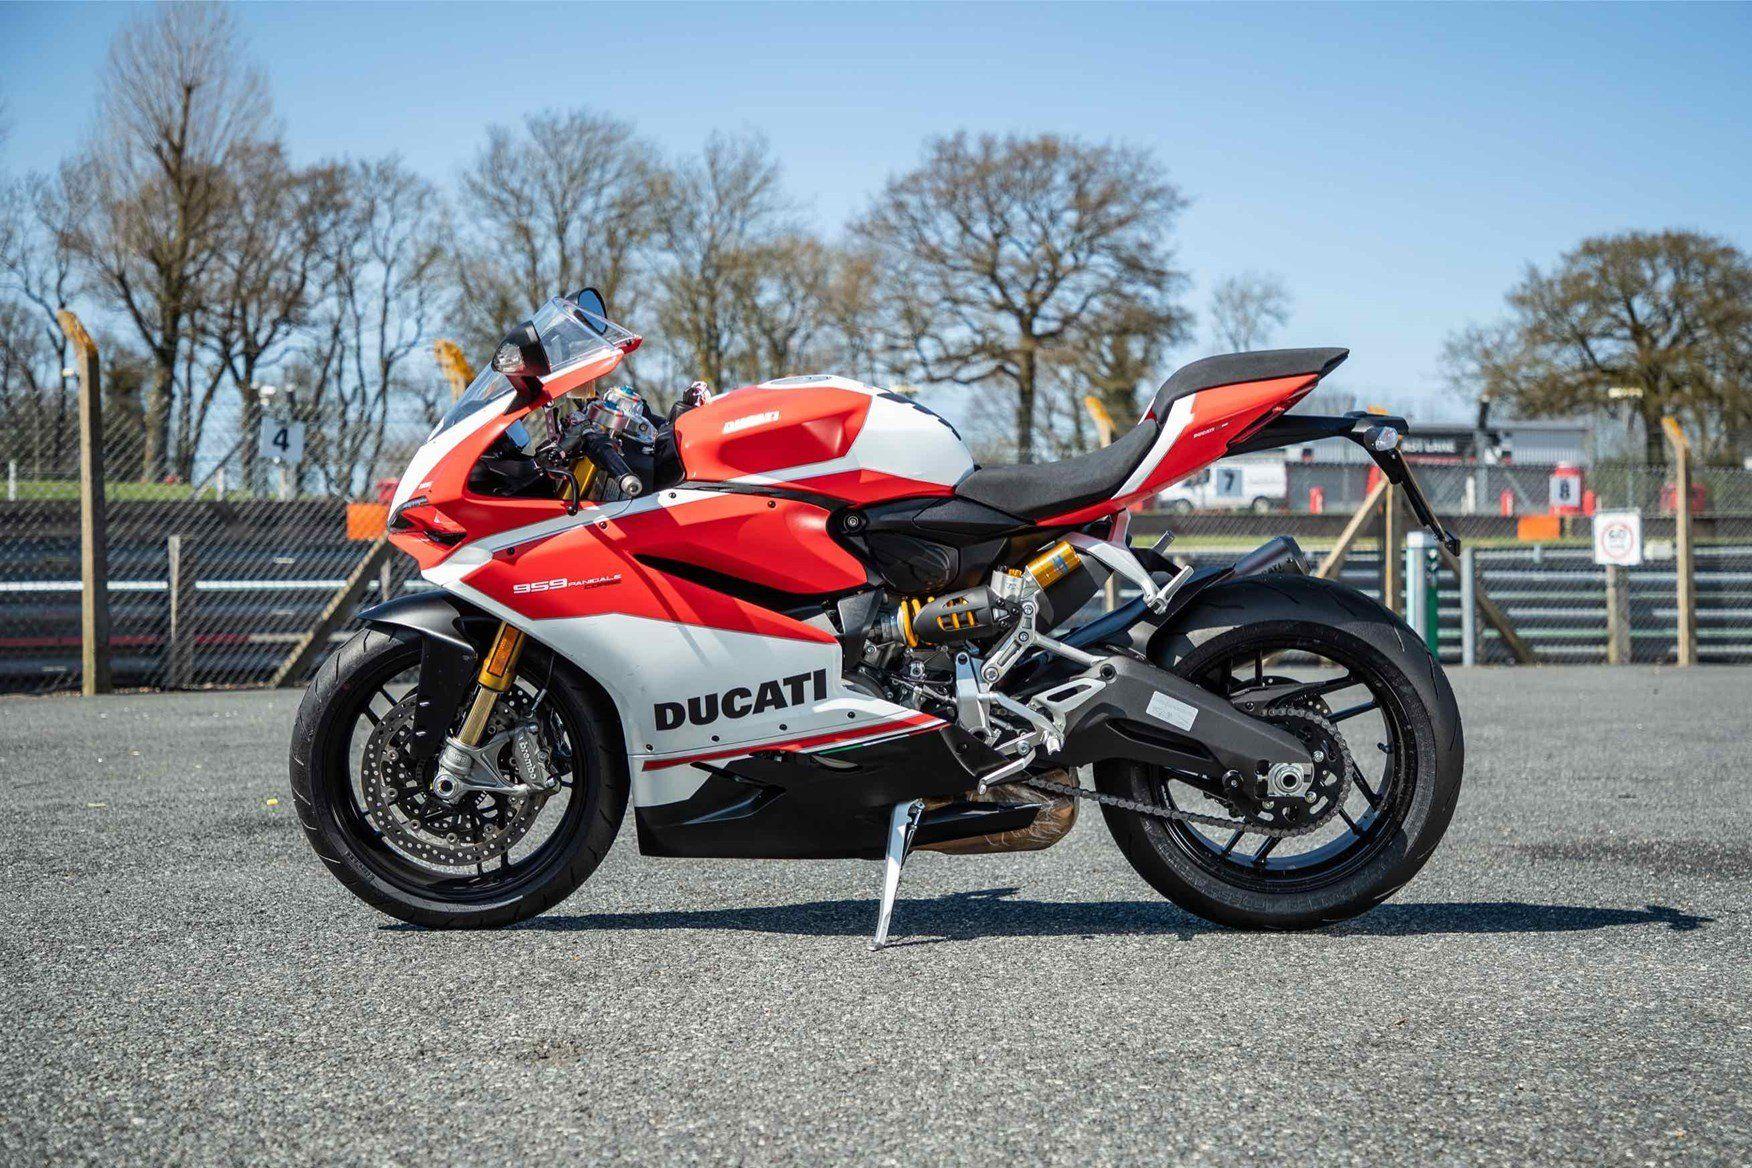 2018 Ducati 899 Model From Ducati 959 Panigale Corse 2018 On